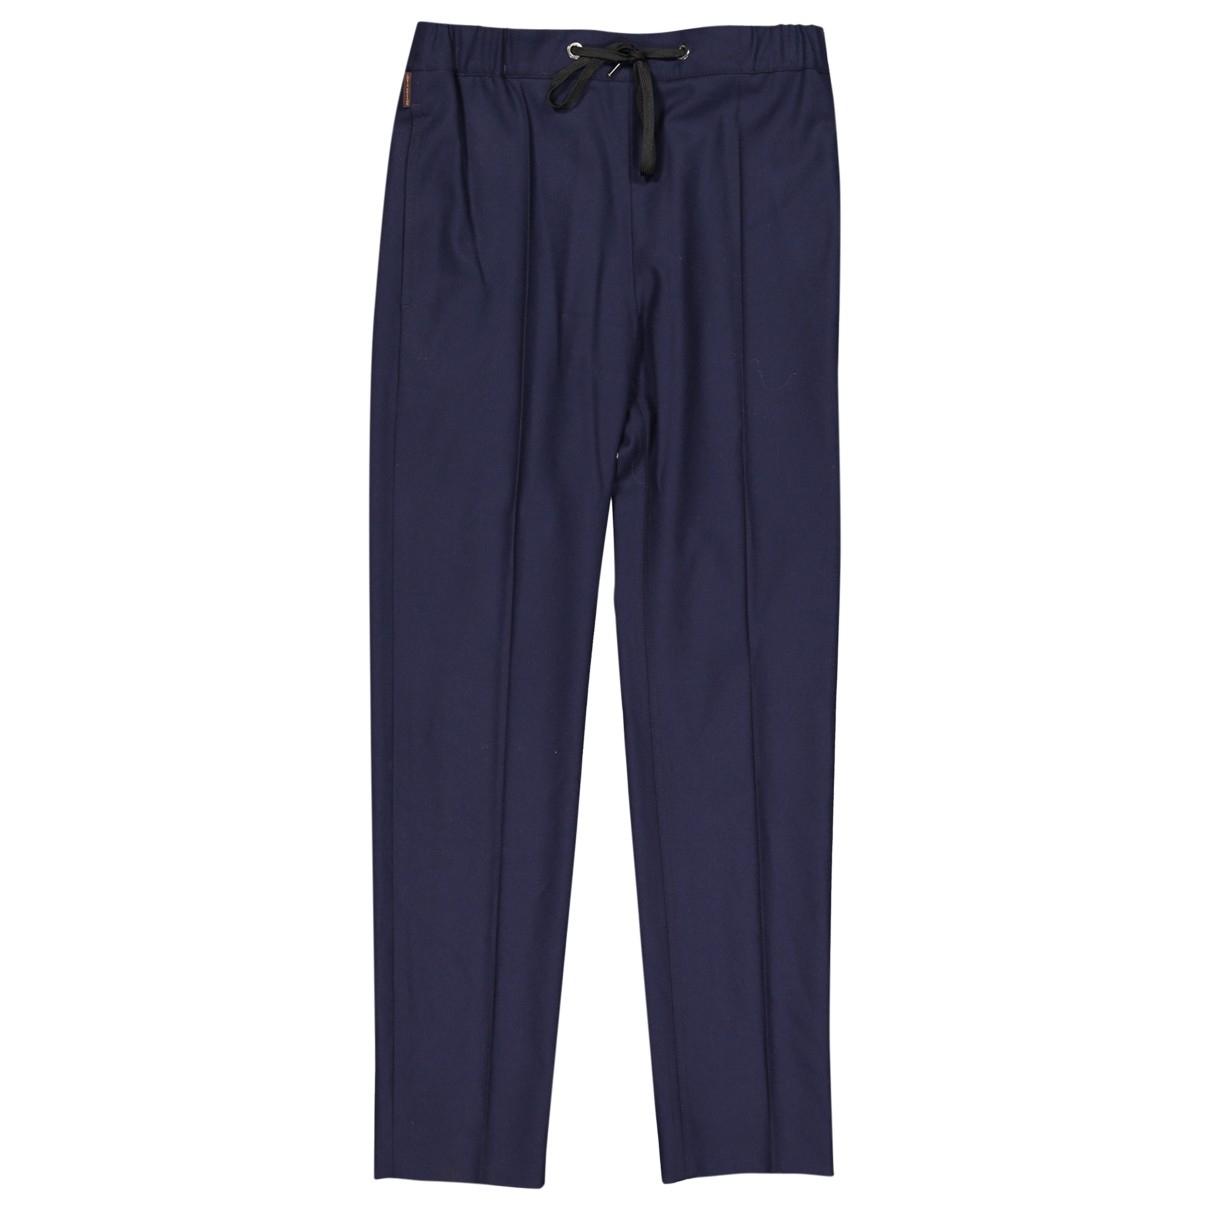 Louis Vuitton \N Navy Wool Trousers for Women 36 FR